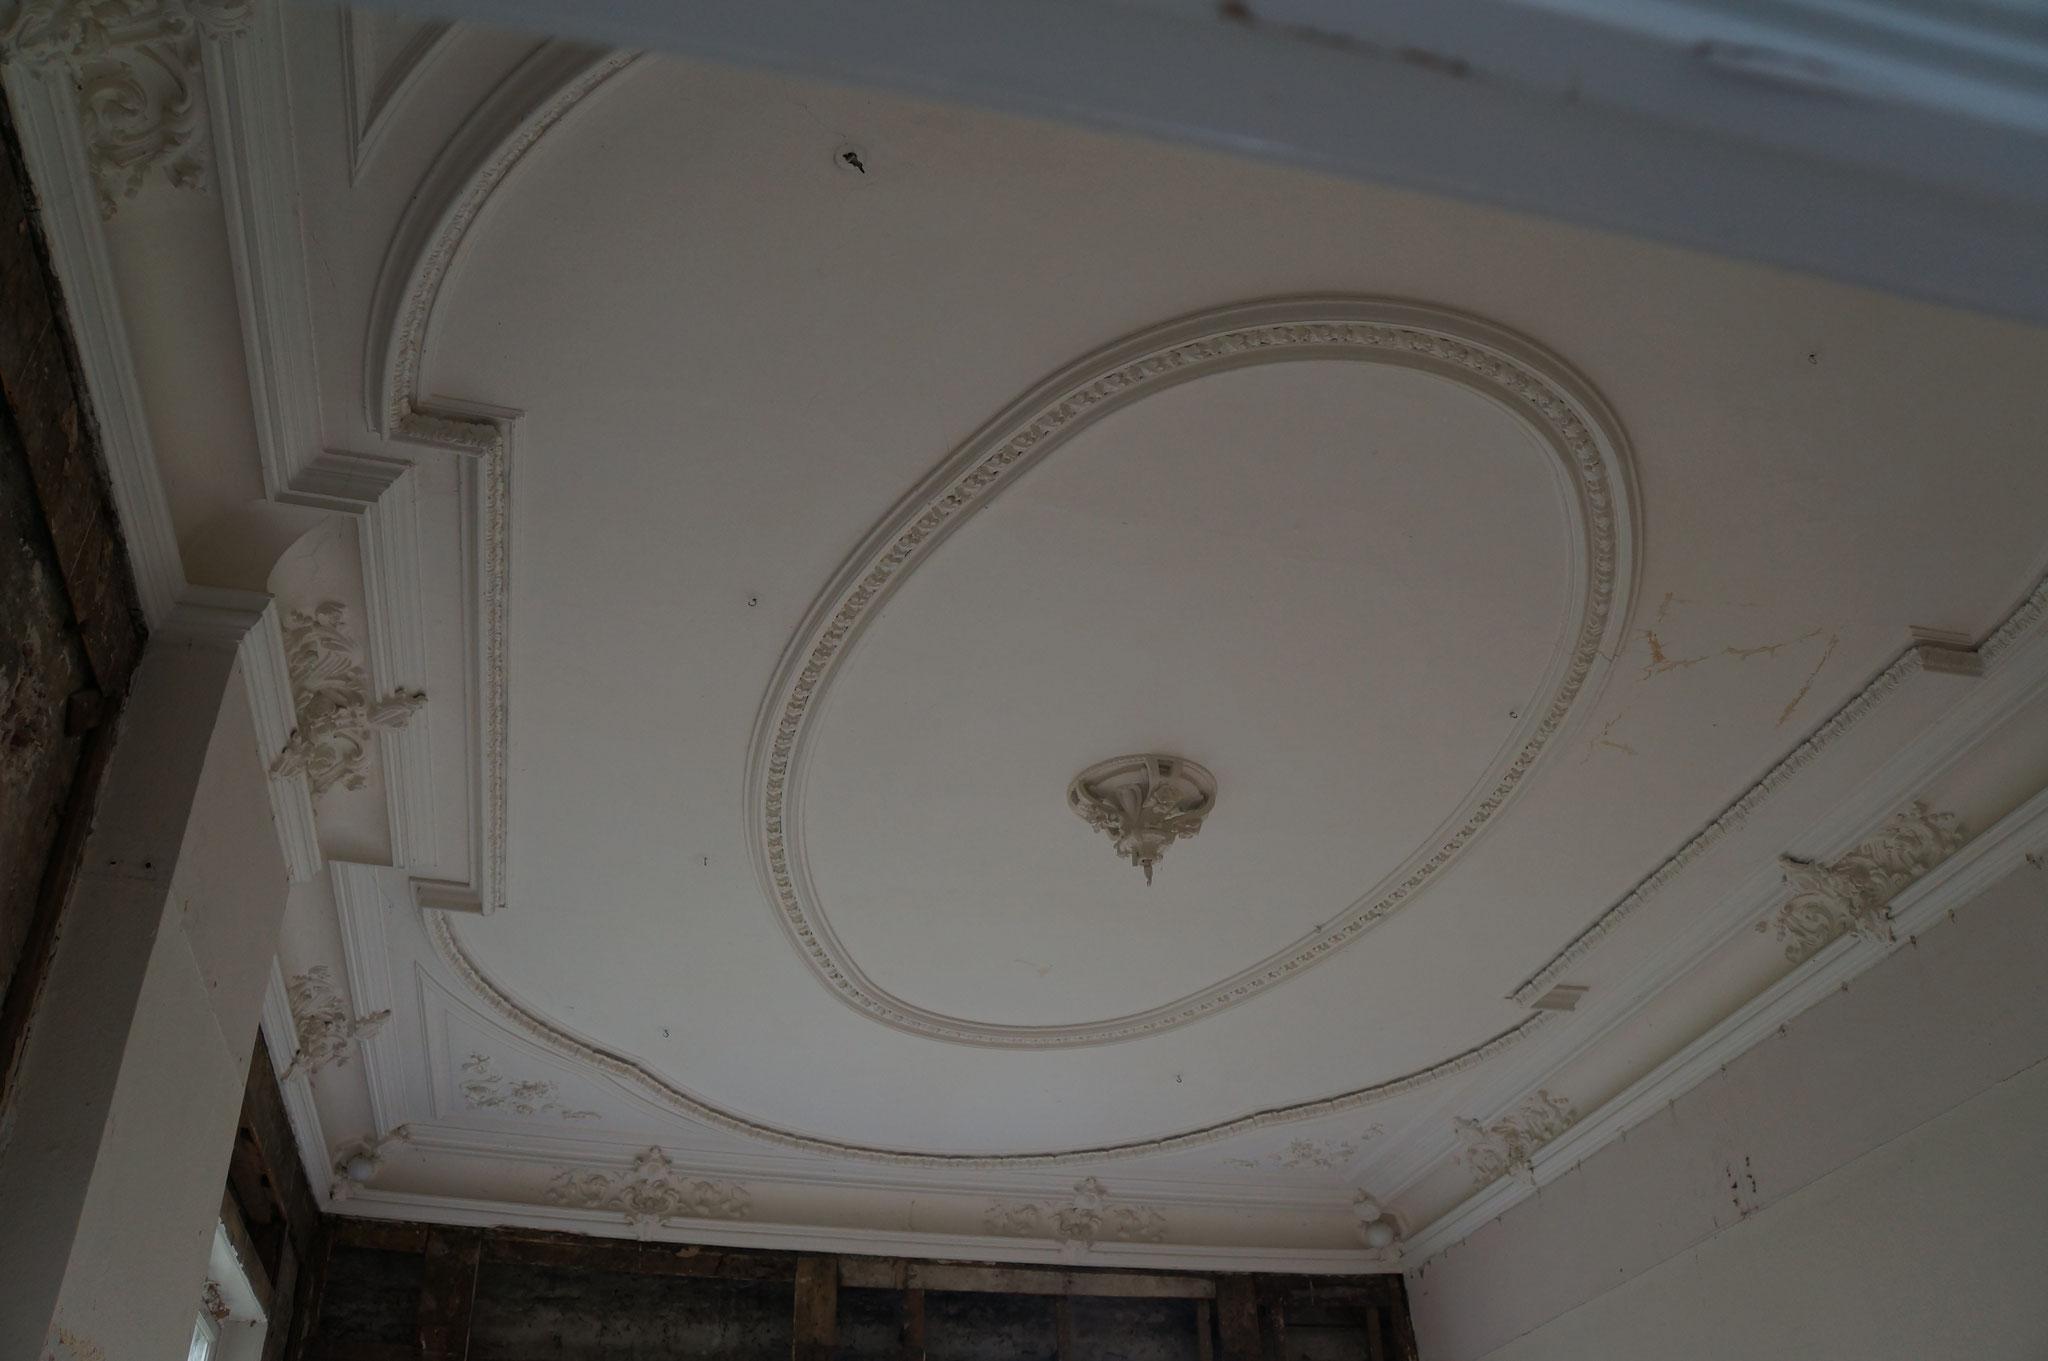 Onder verlaagd plafond aangetroffen rijk gedecoreerd stucplafond